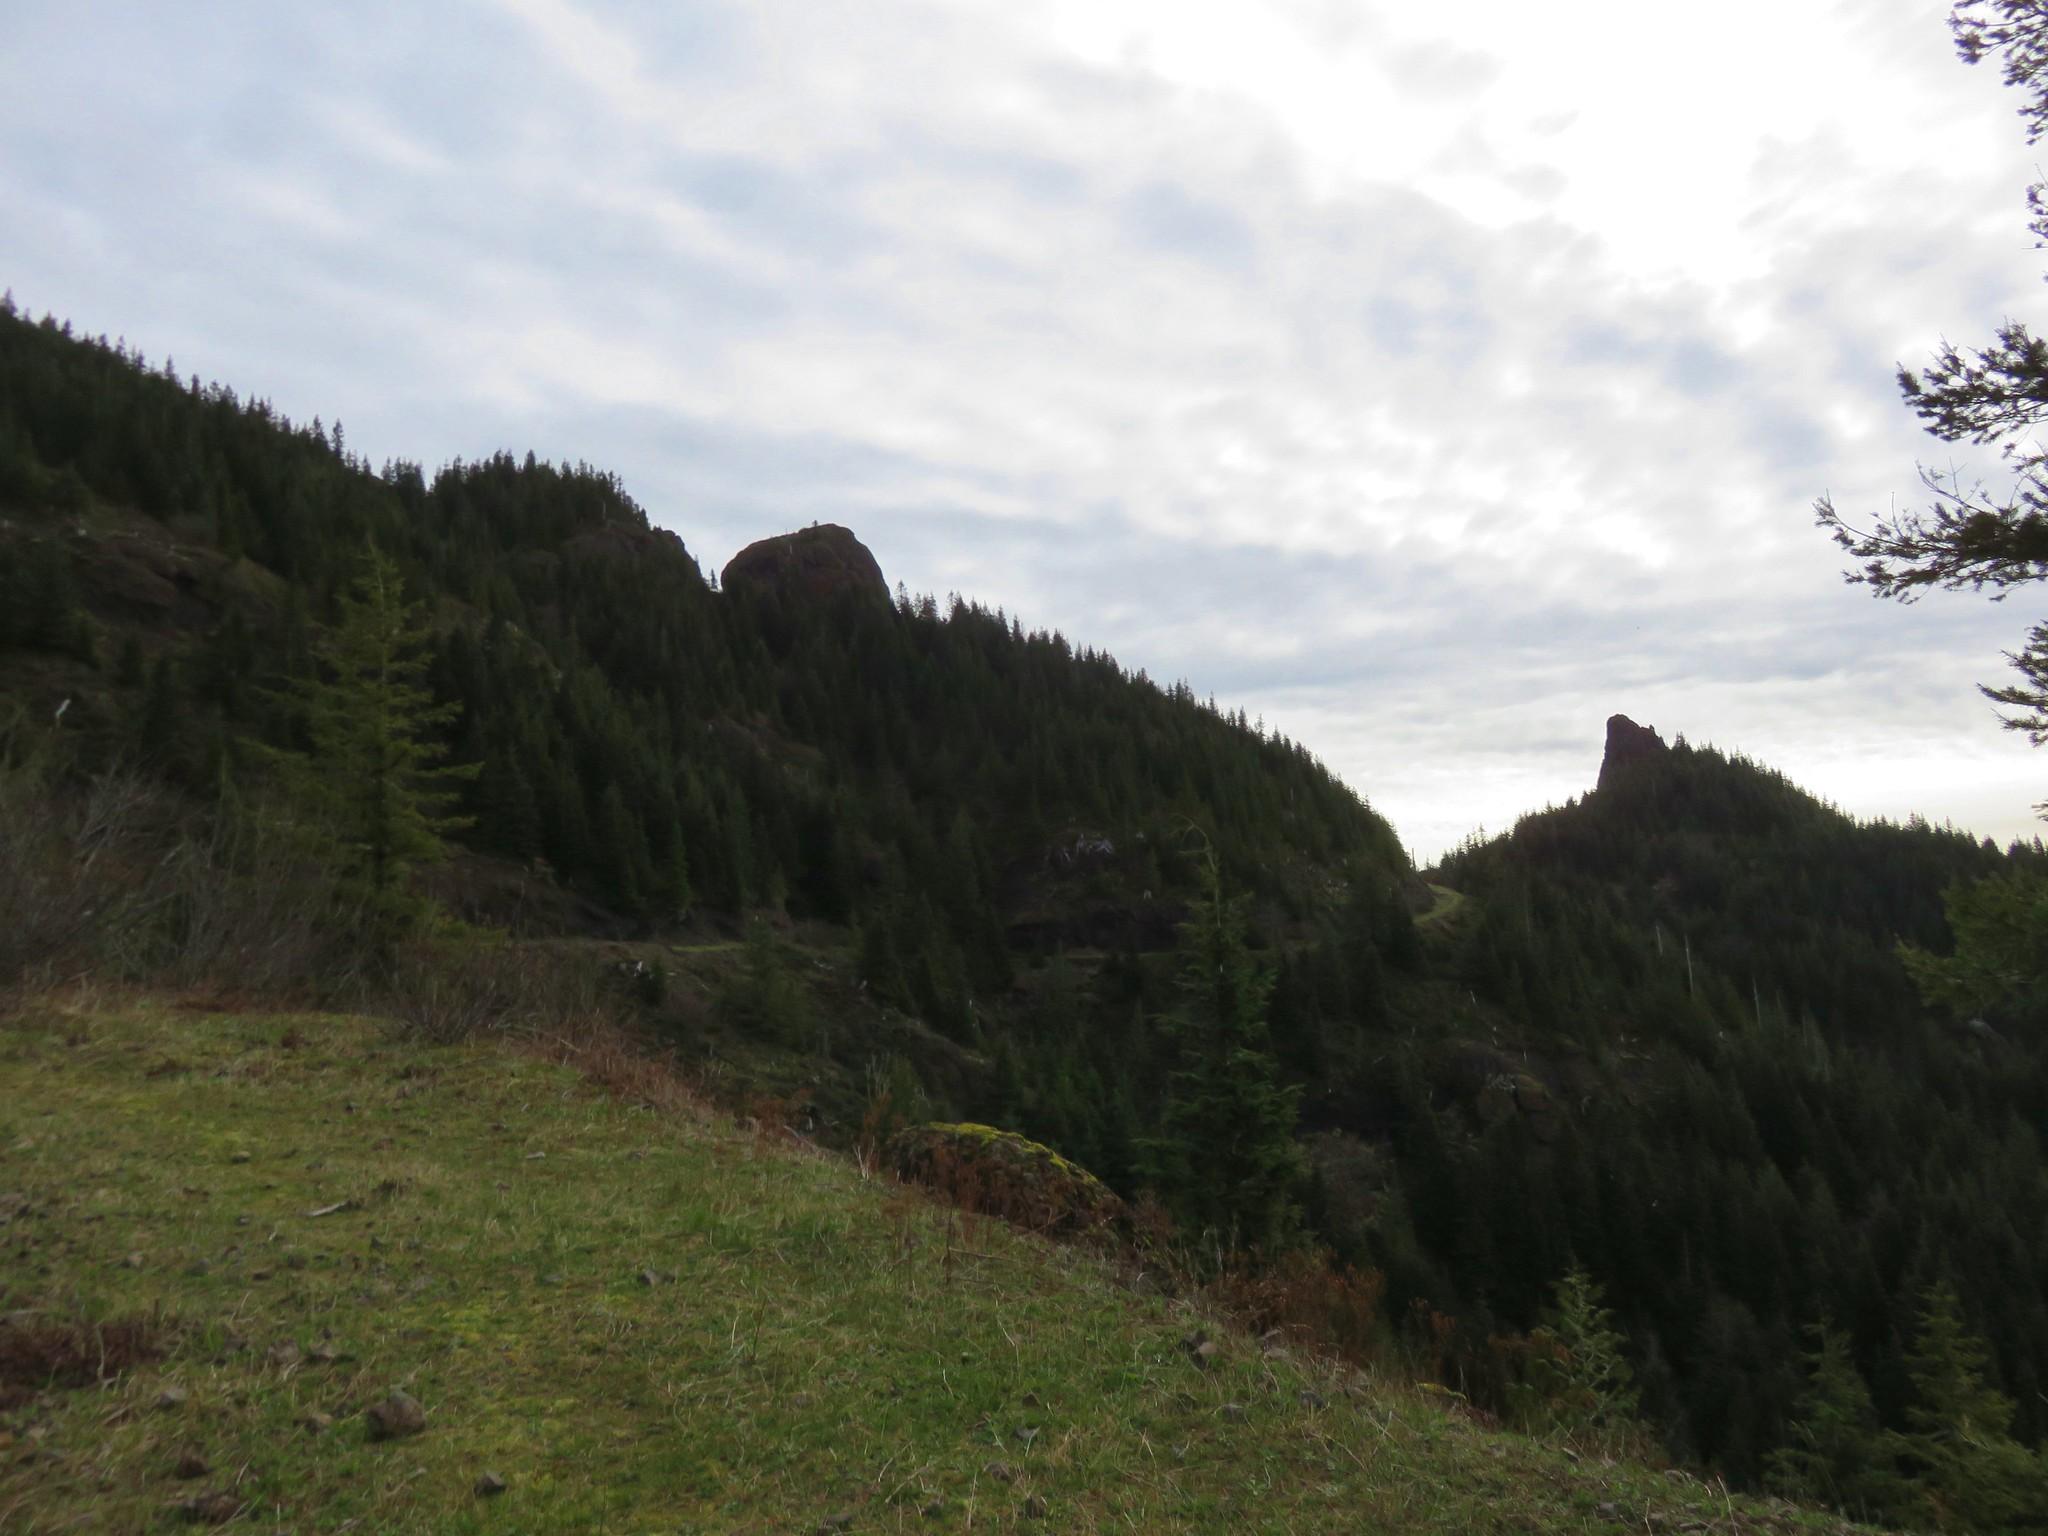 Revenge of Angora and Little Angora rock pinnacles